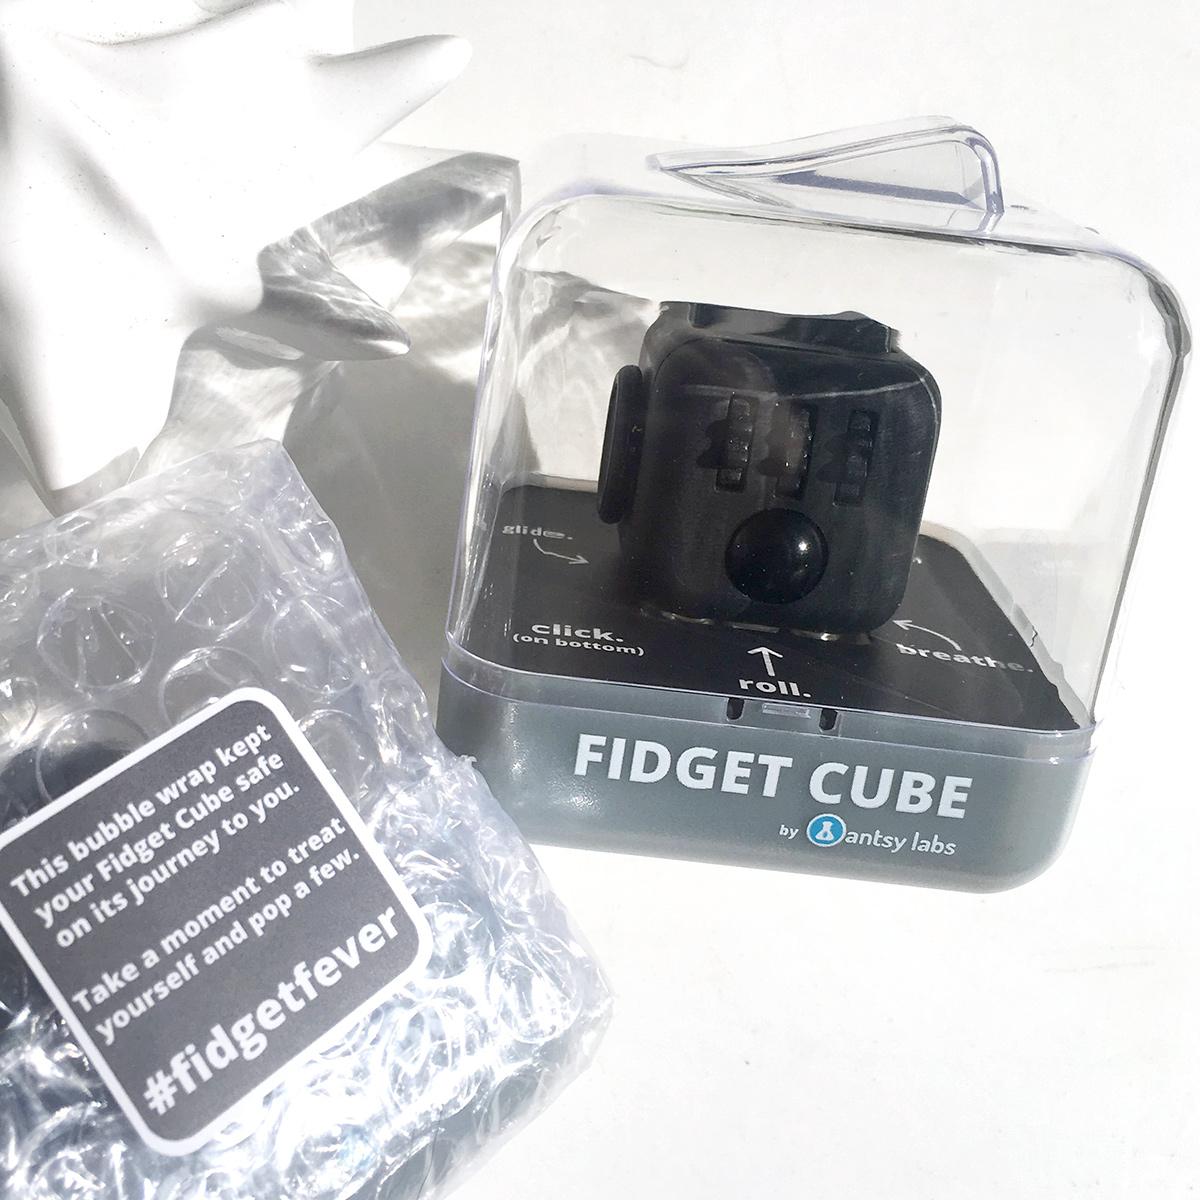 fidget1.jpg